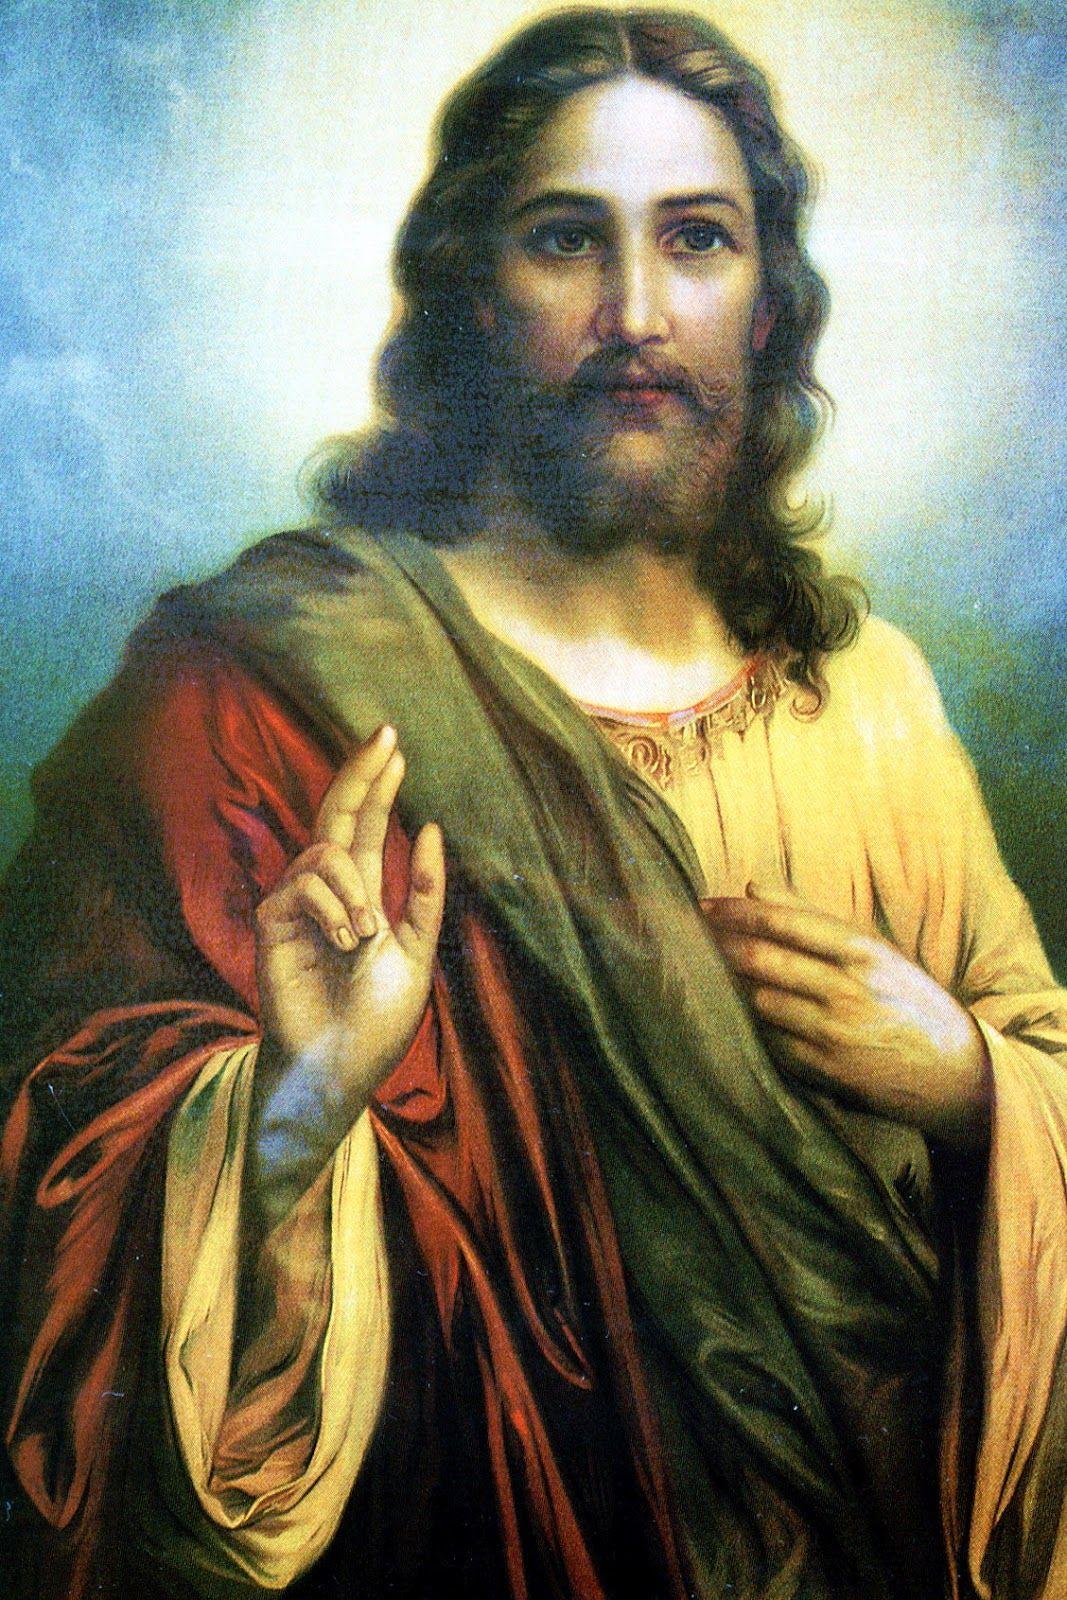 jesus médico divino em português - Yahoo Image Search Results | Jesus, Jesus  christ, Bearded lady